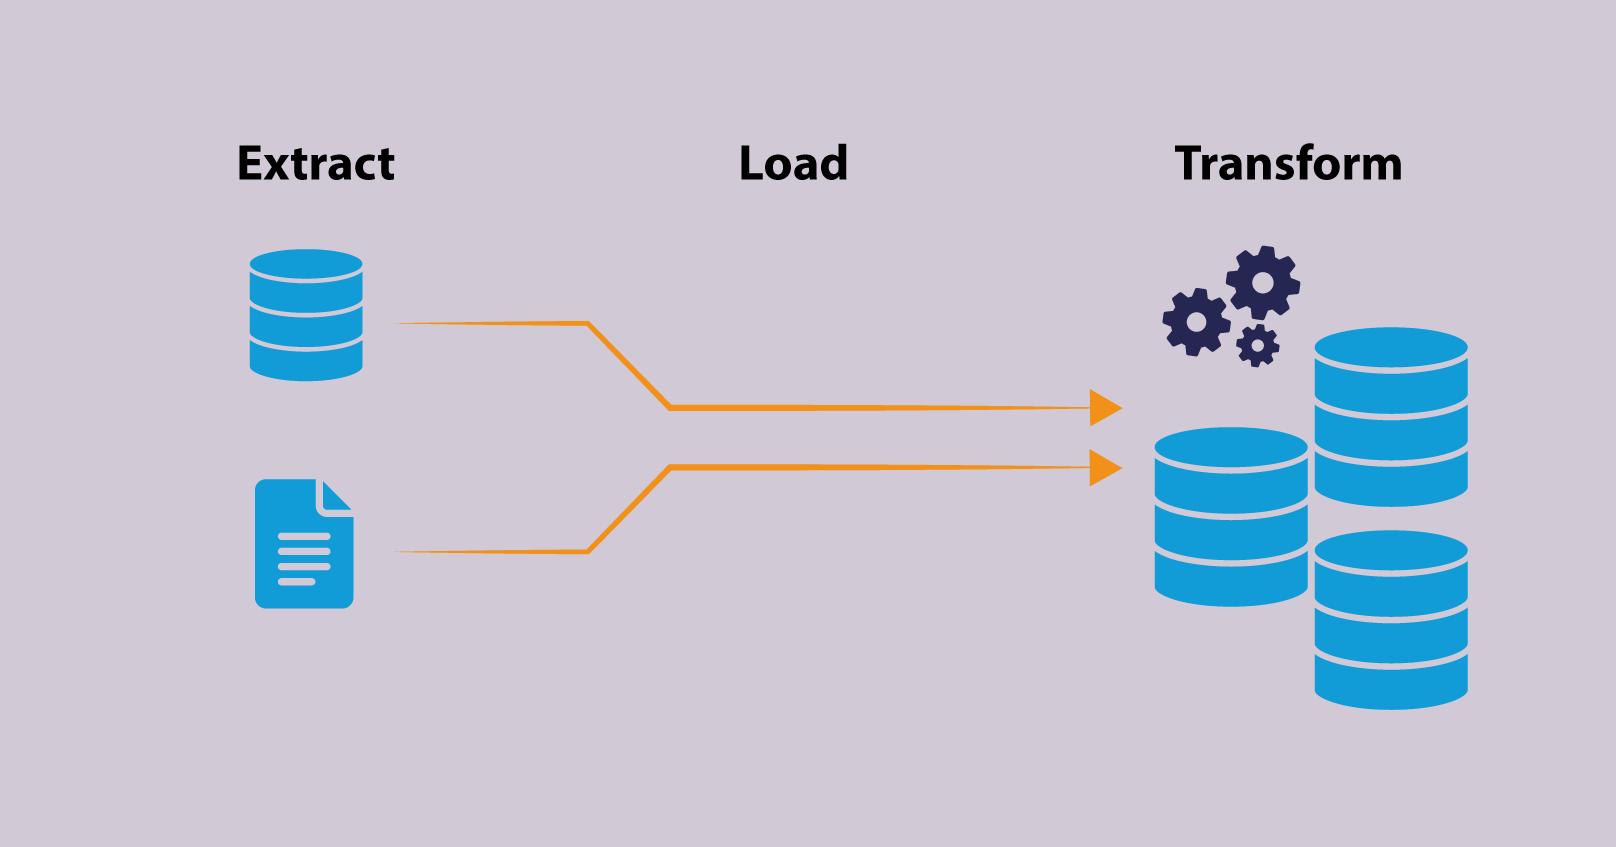 Processo ELT (Extract-Load-Transform)